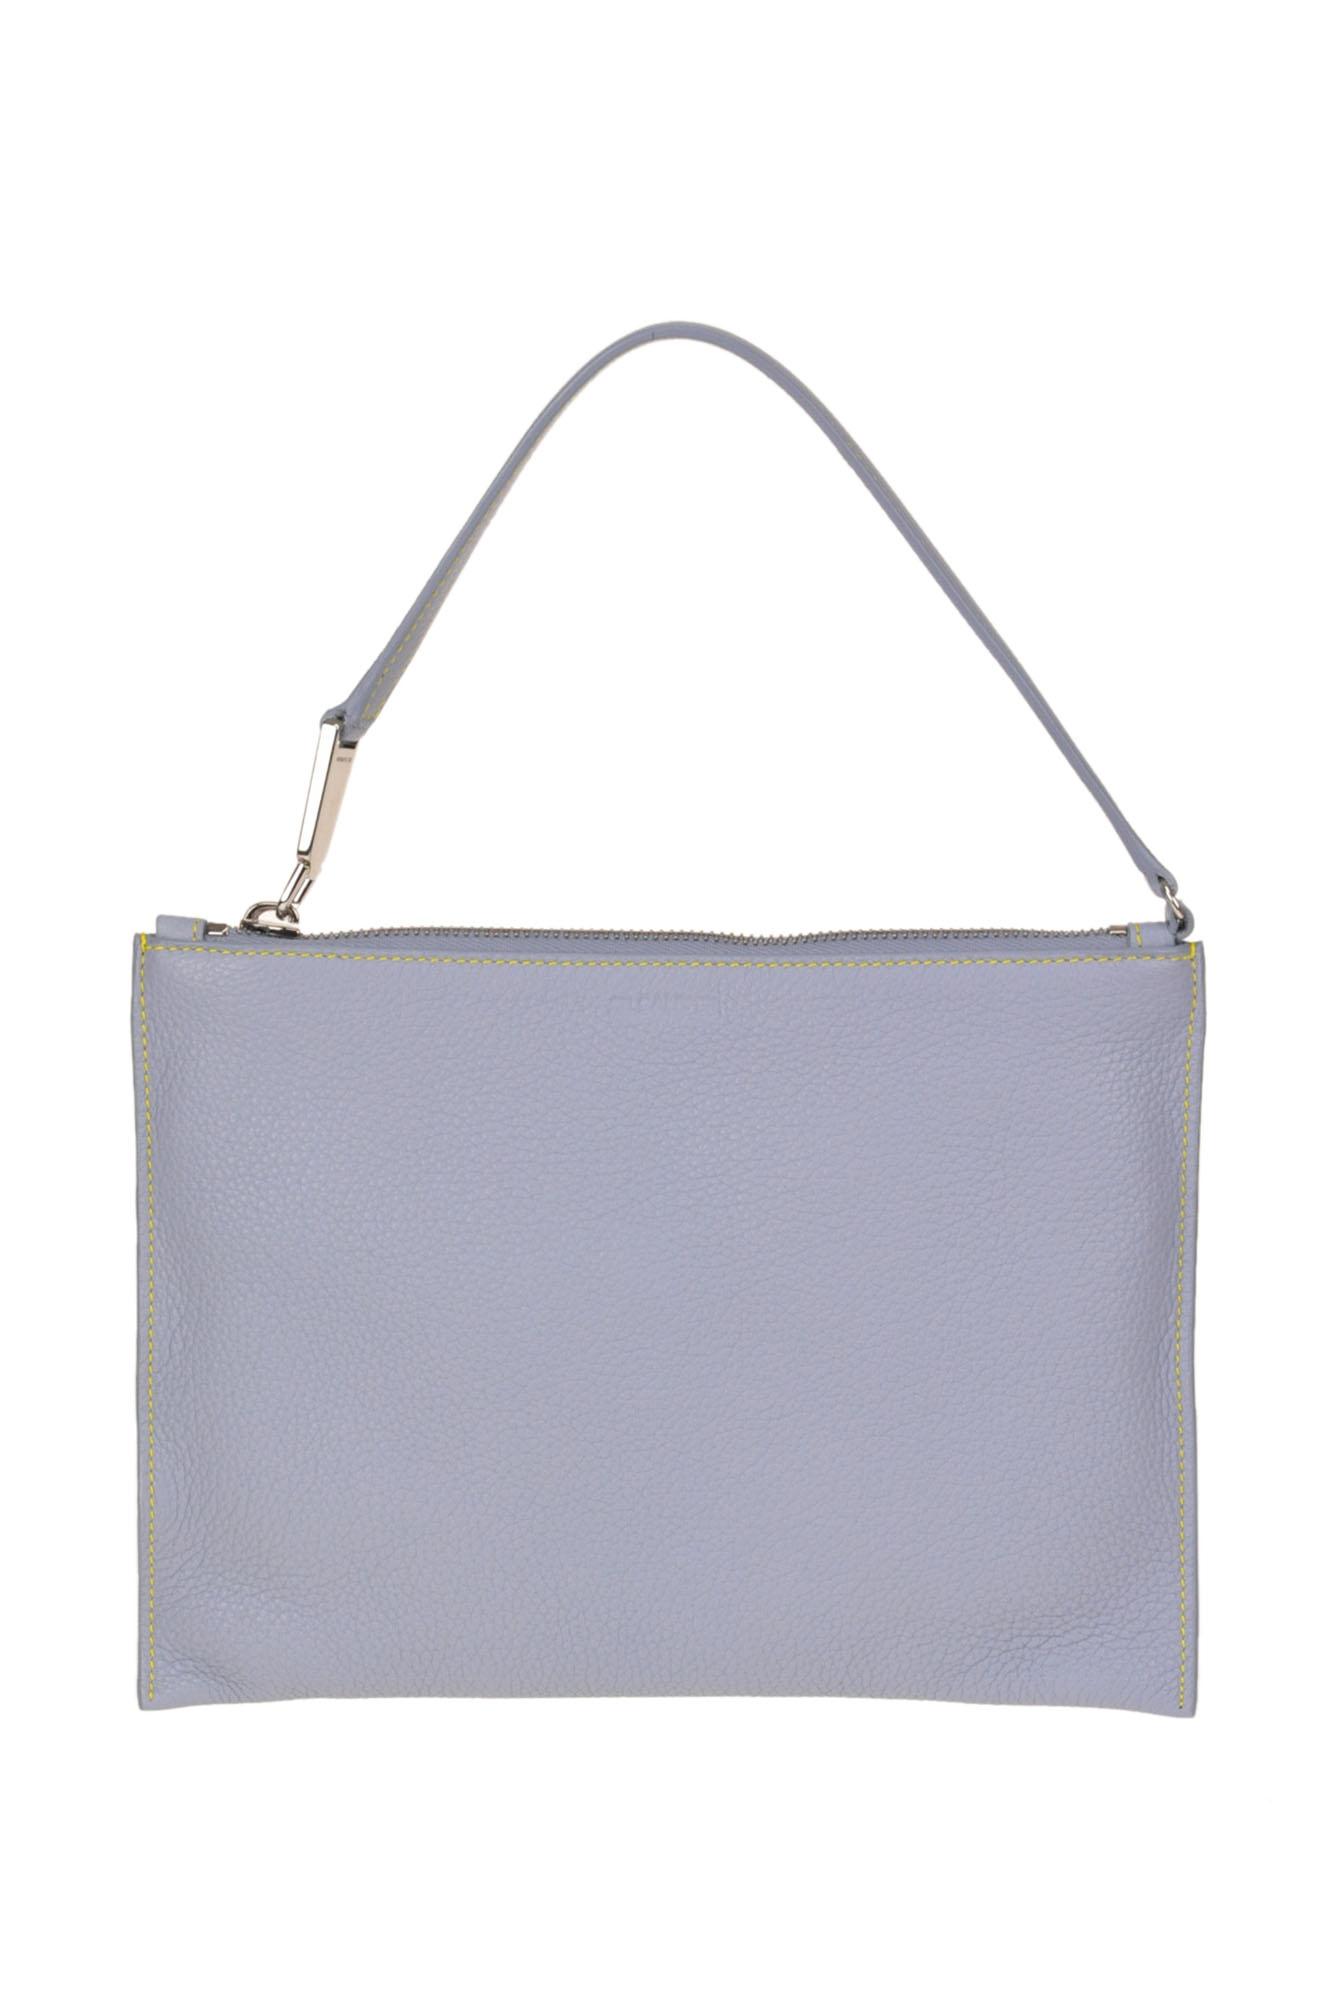 9e80d90612 Jil Sander Leather Envelope Bag In Sugar Paper | ModeSens